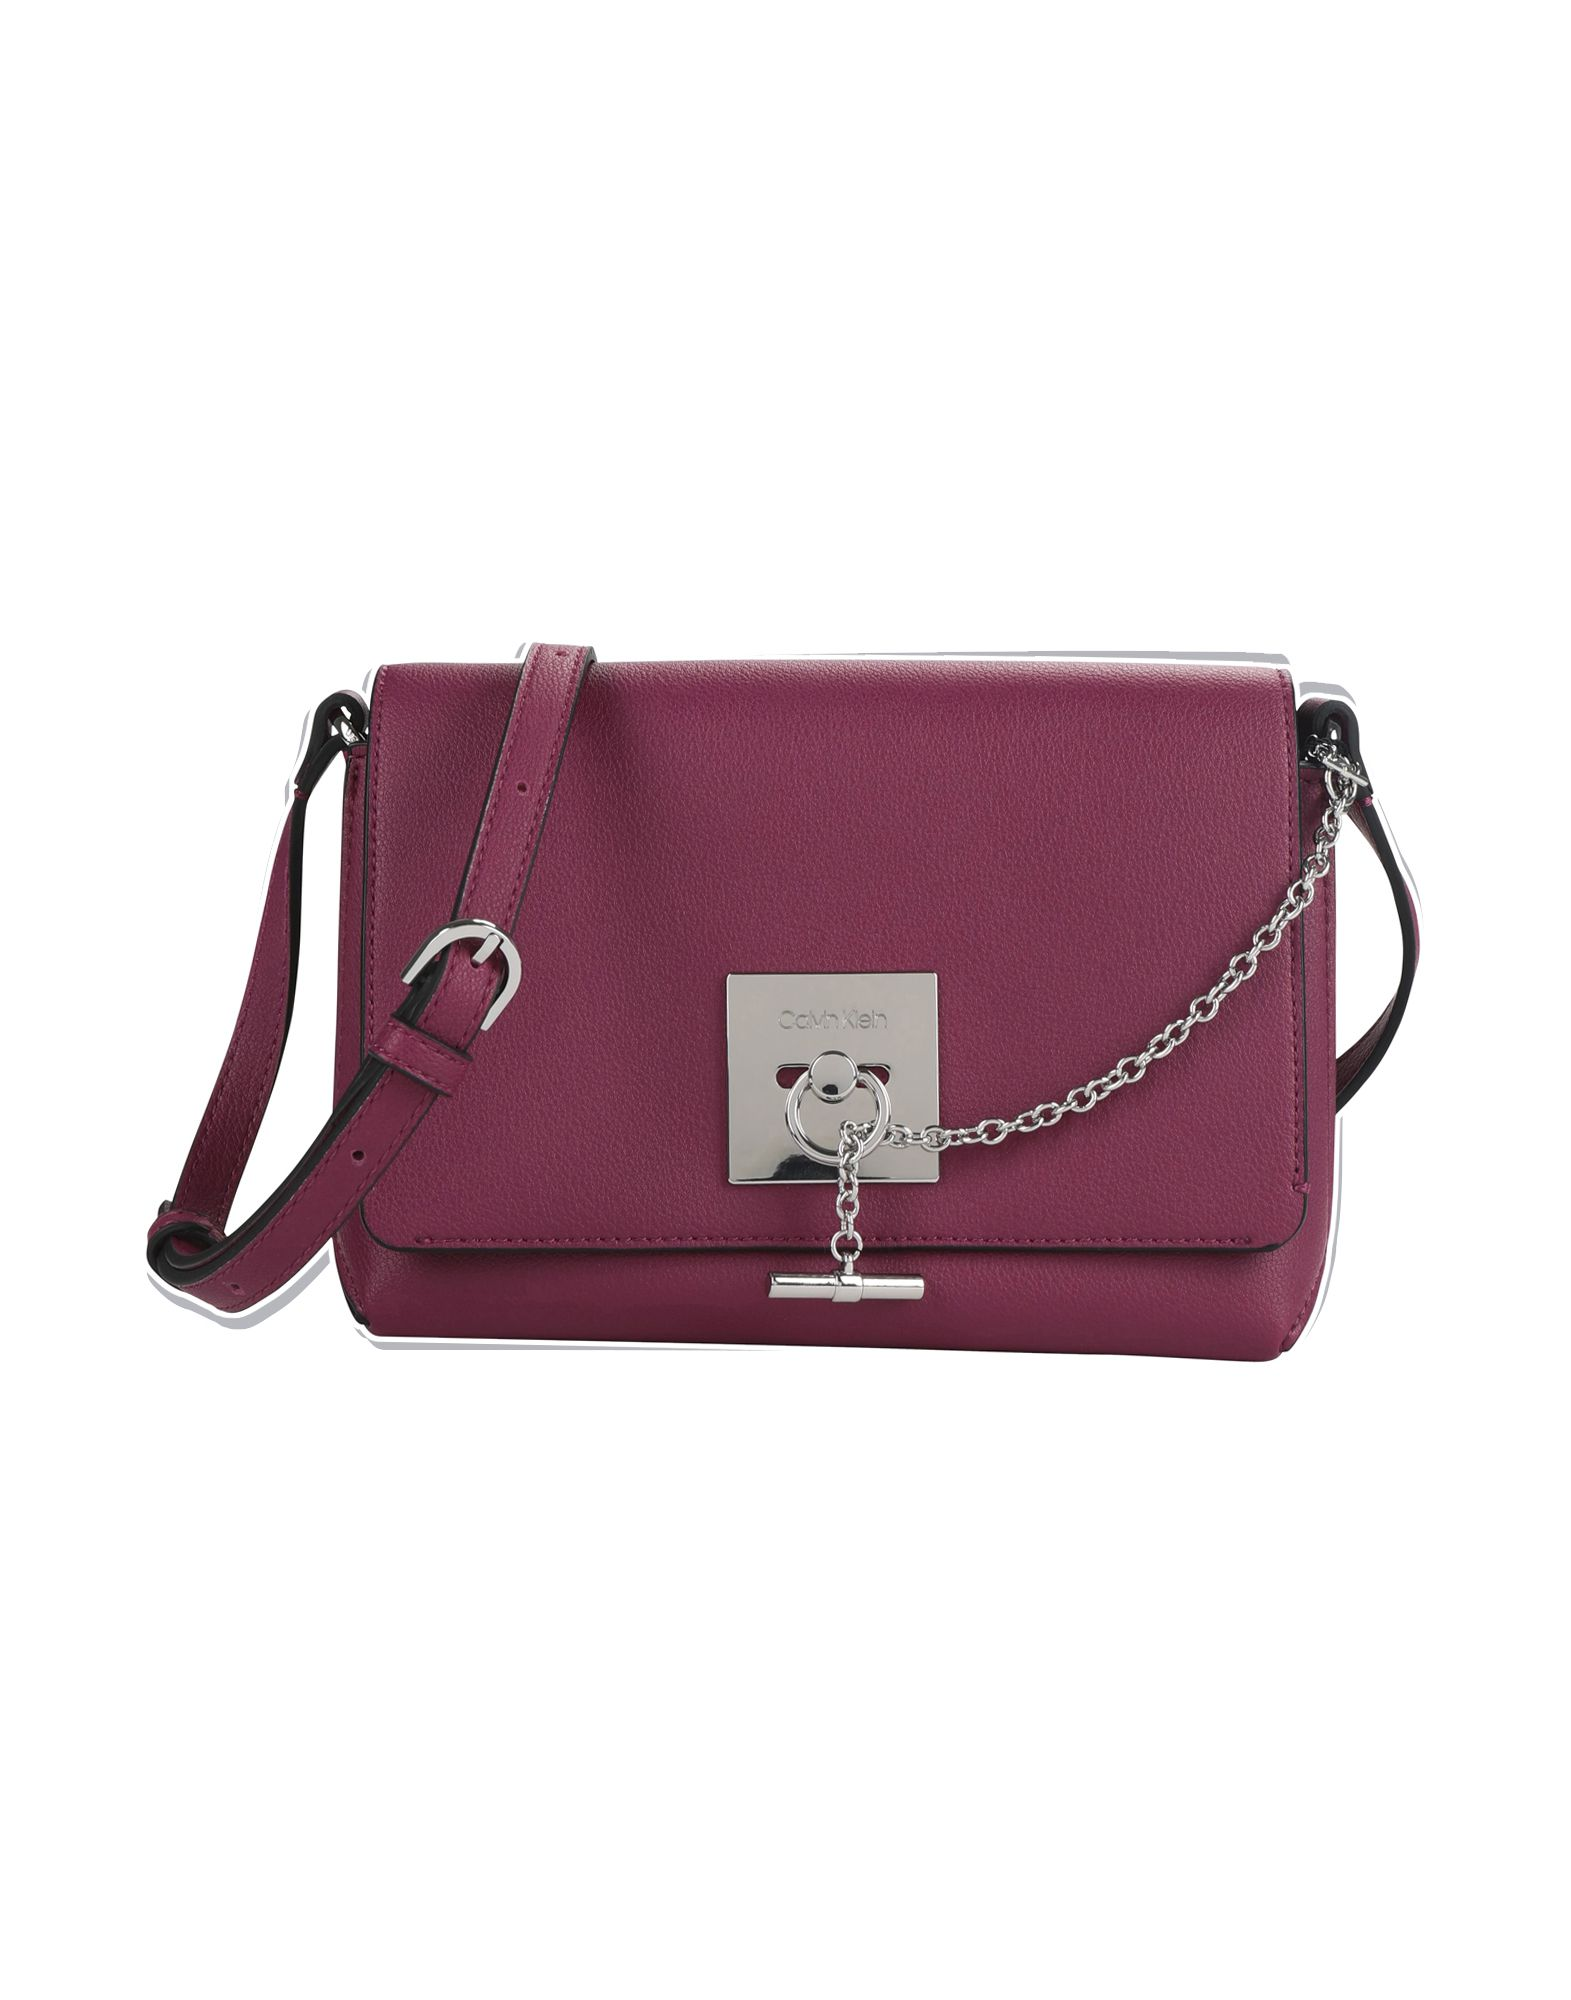 fc0b717b17 Τσάντα Ταχυδρόμου Calvin Klein Γυναίκα - Τσάντες Ταχυδρόμου Calvin Klein  στο YOOX - 45451932EV